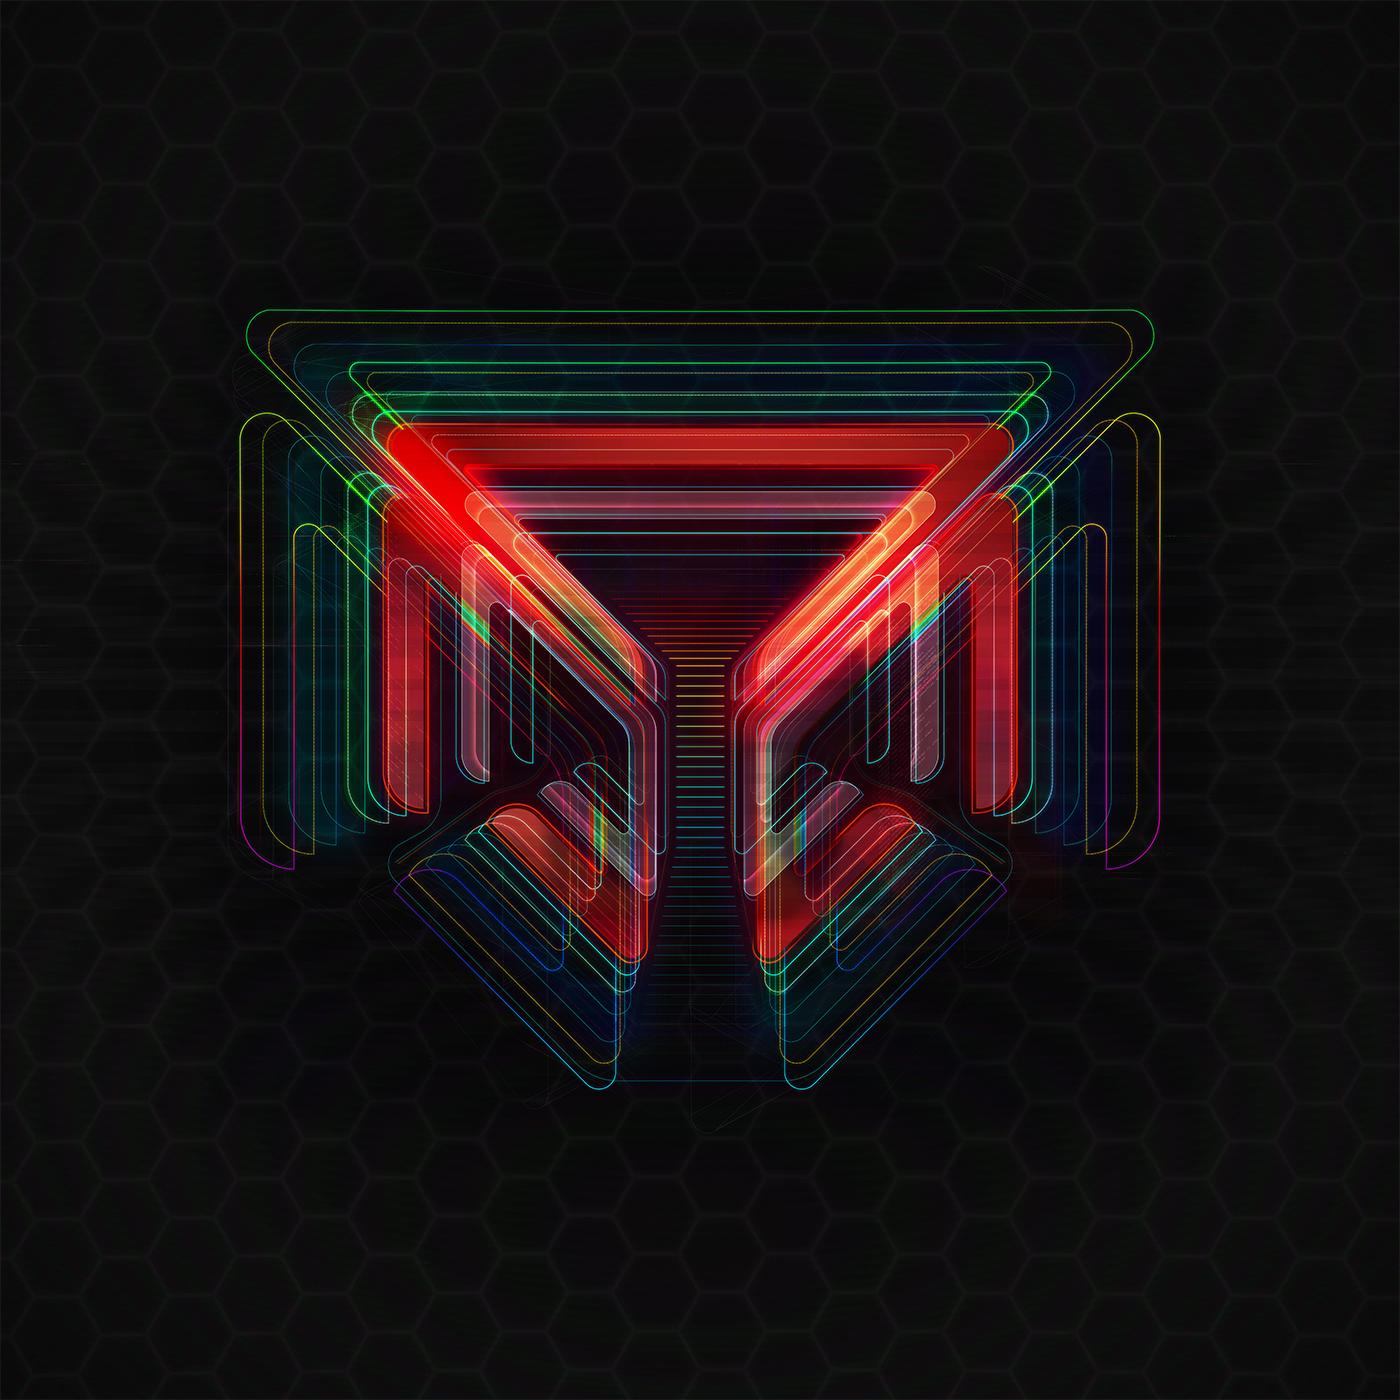 logo Cyberpunk tech deus ex Patterns glow lighting complex large coloruful